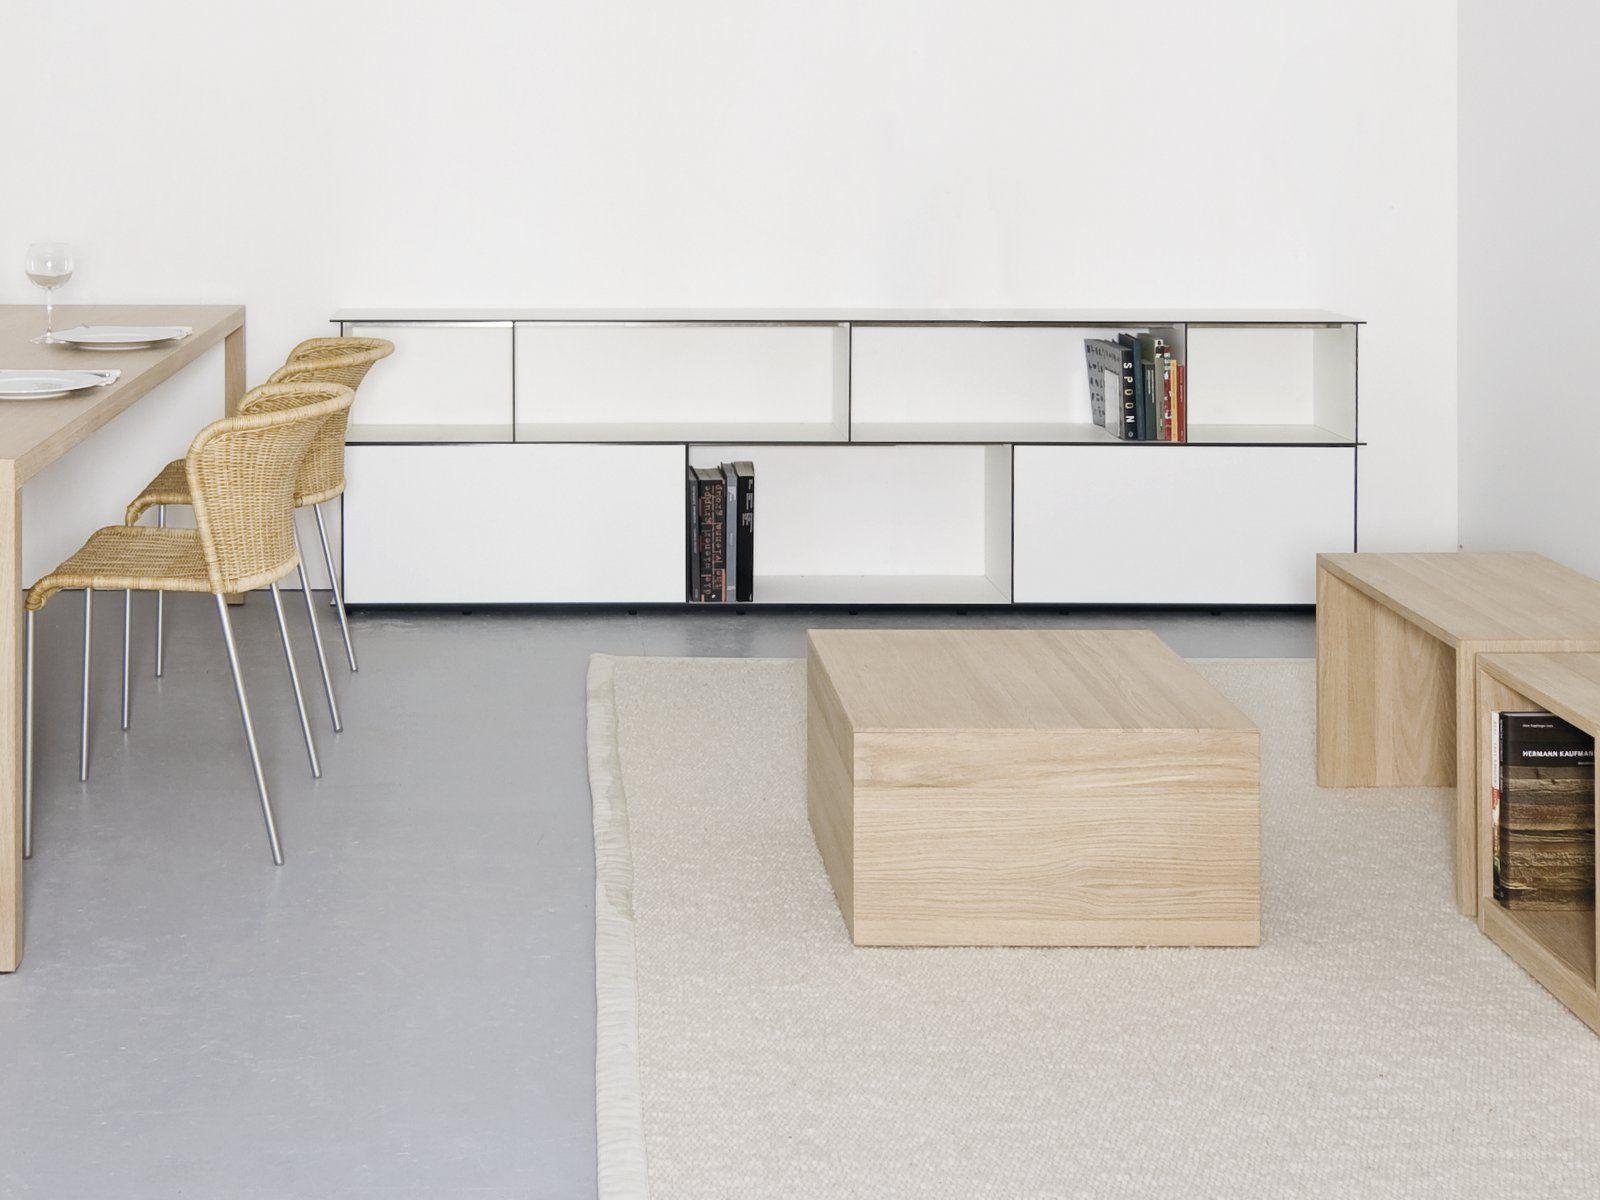 Libreria modulare digital by sanktjohanser design matthias for Libreria modulare